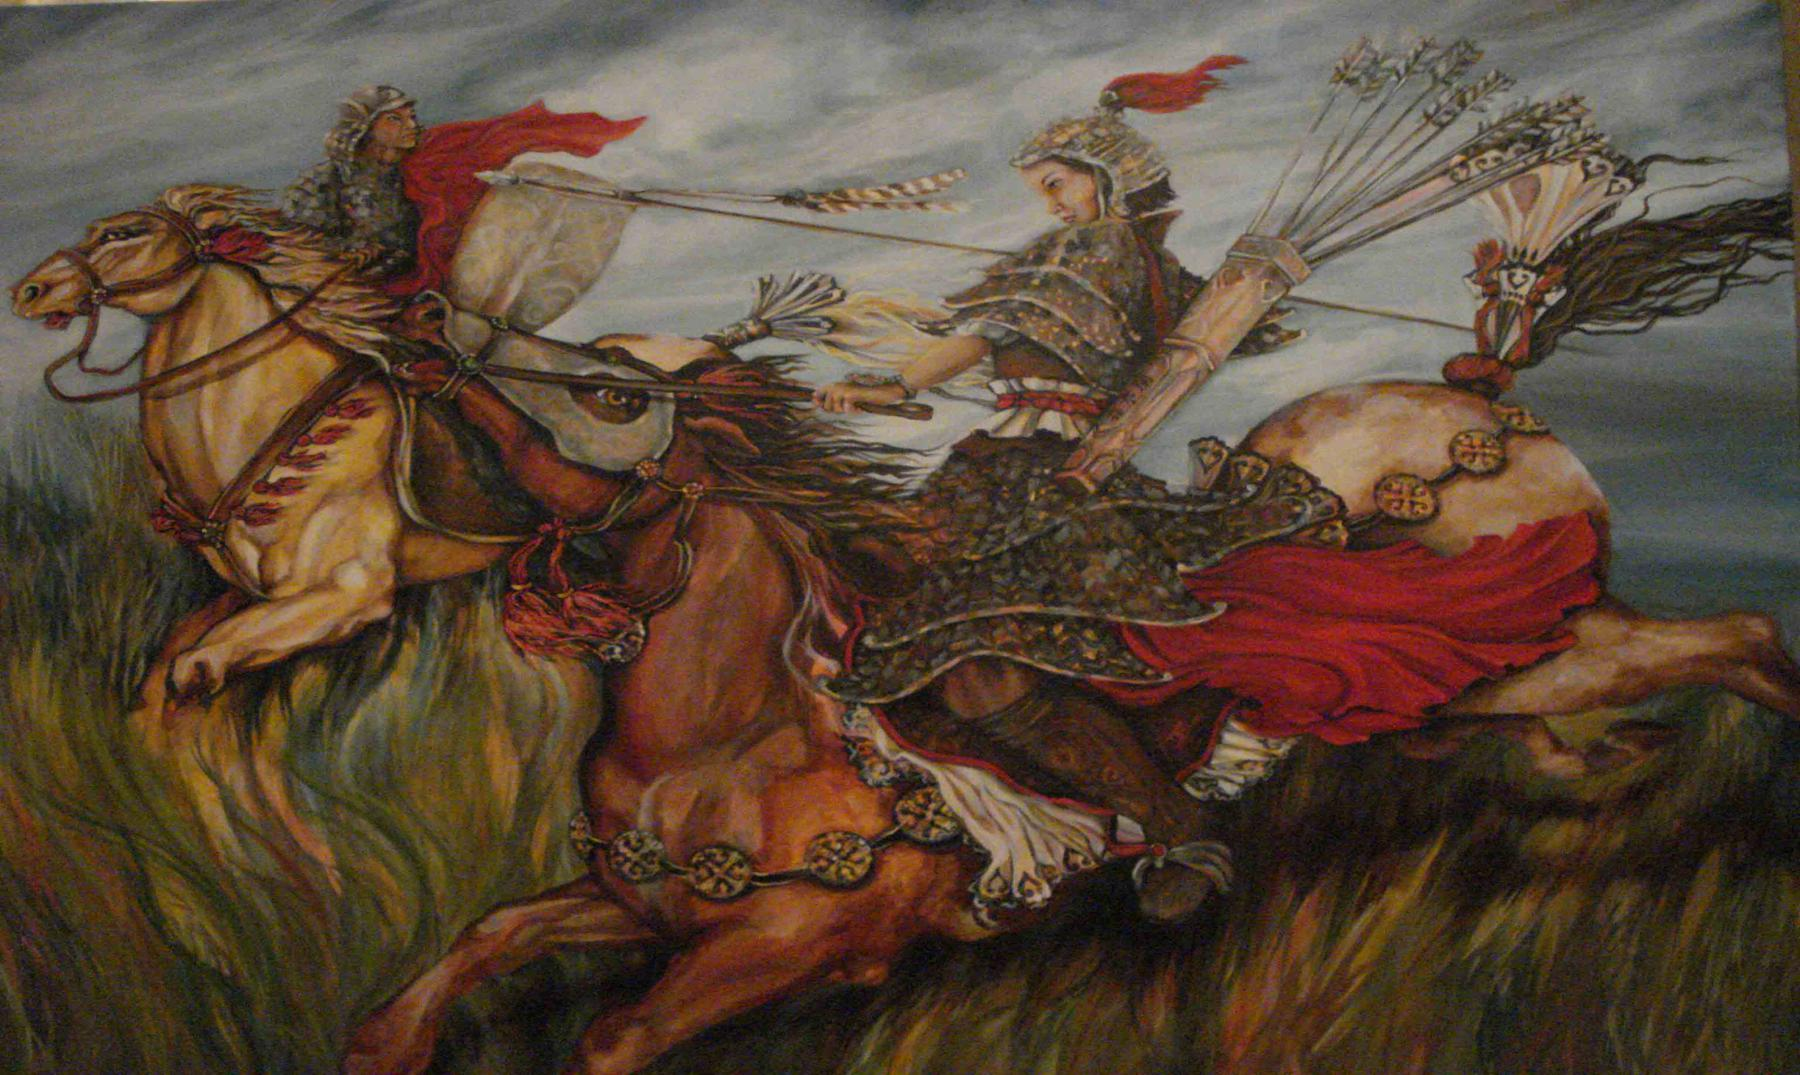 La verdadera historia de Mulán, la heroína china